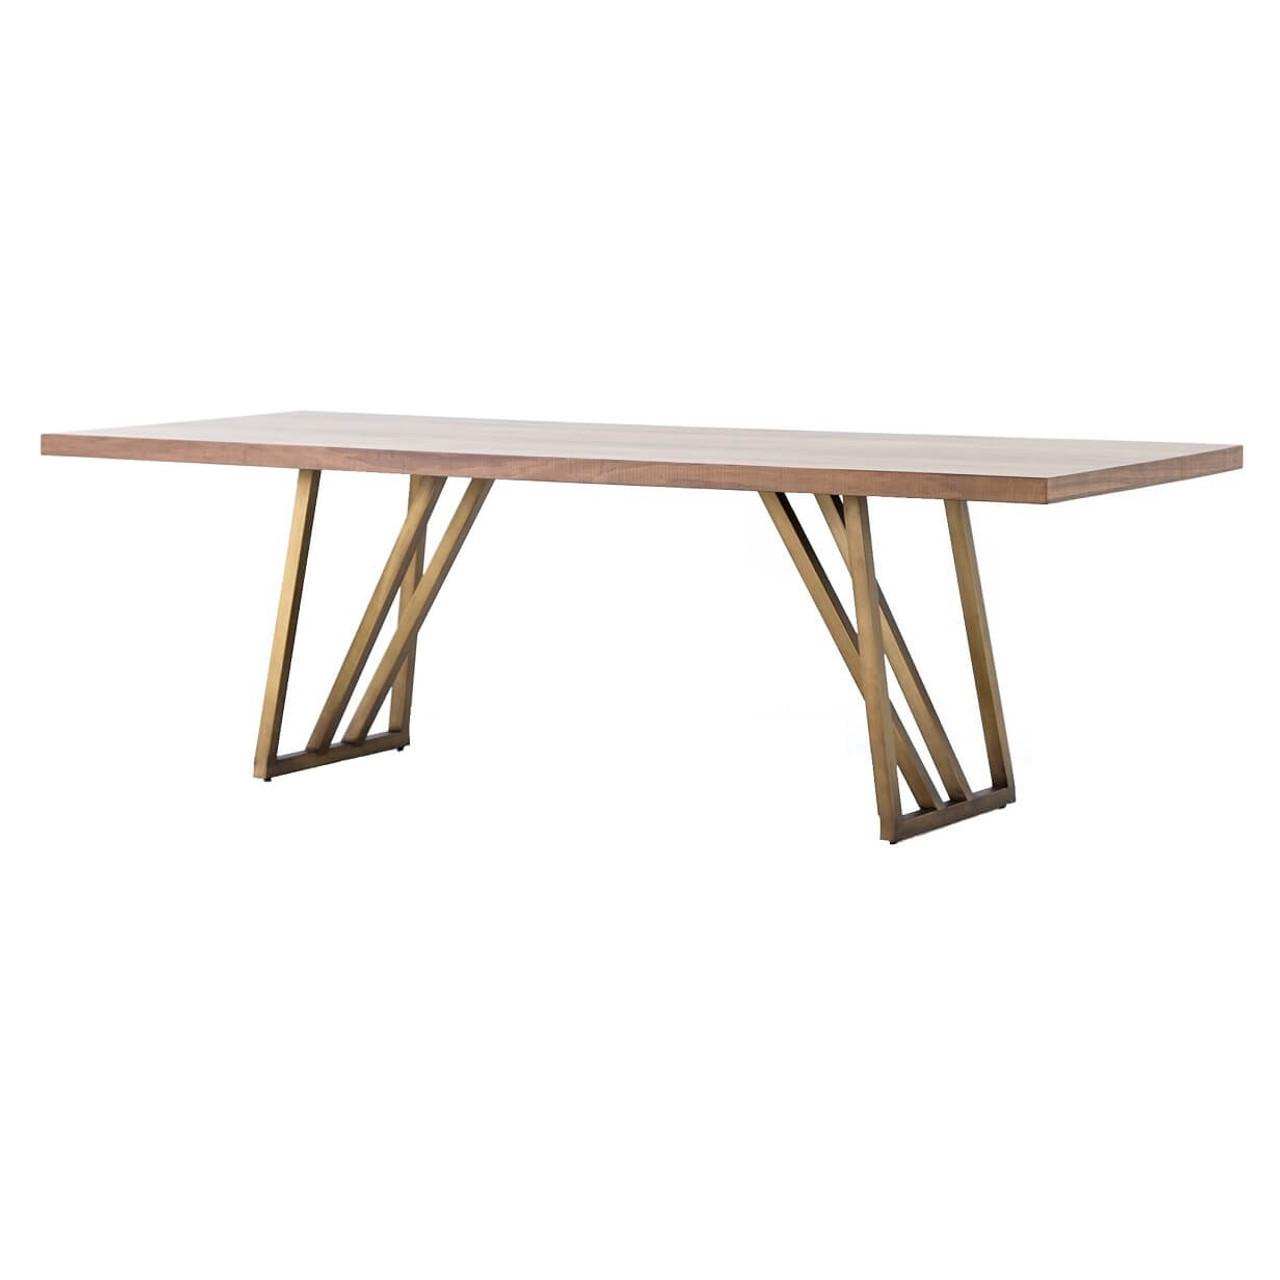 Kapri Antique Bronze Base Walnut Wood Dining Table 96 Zin Home